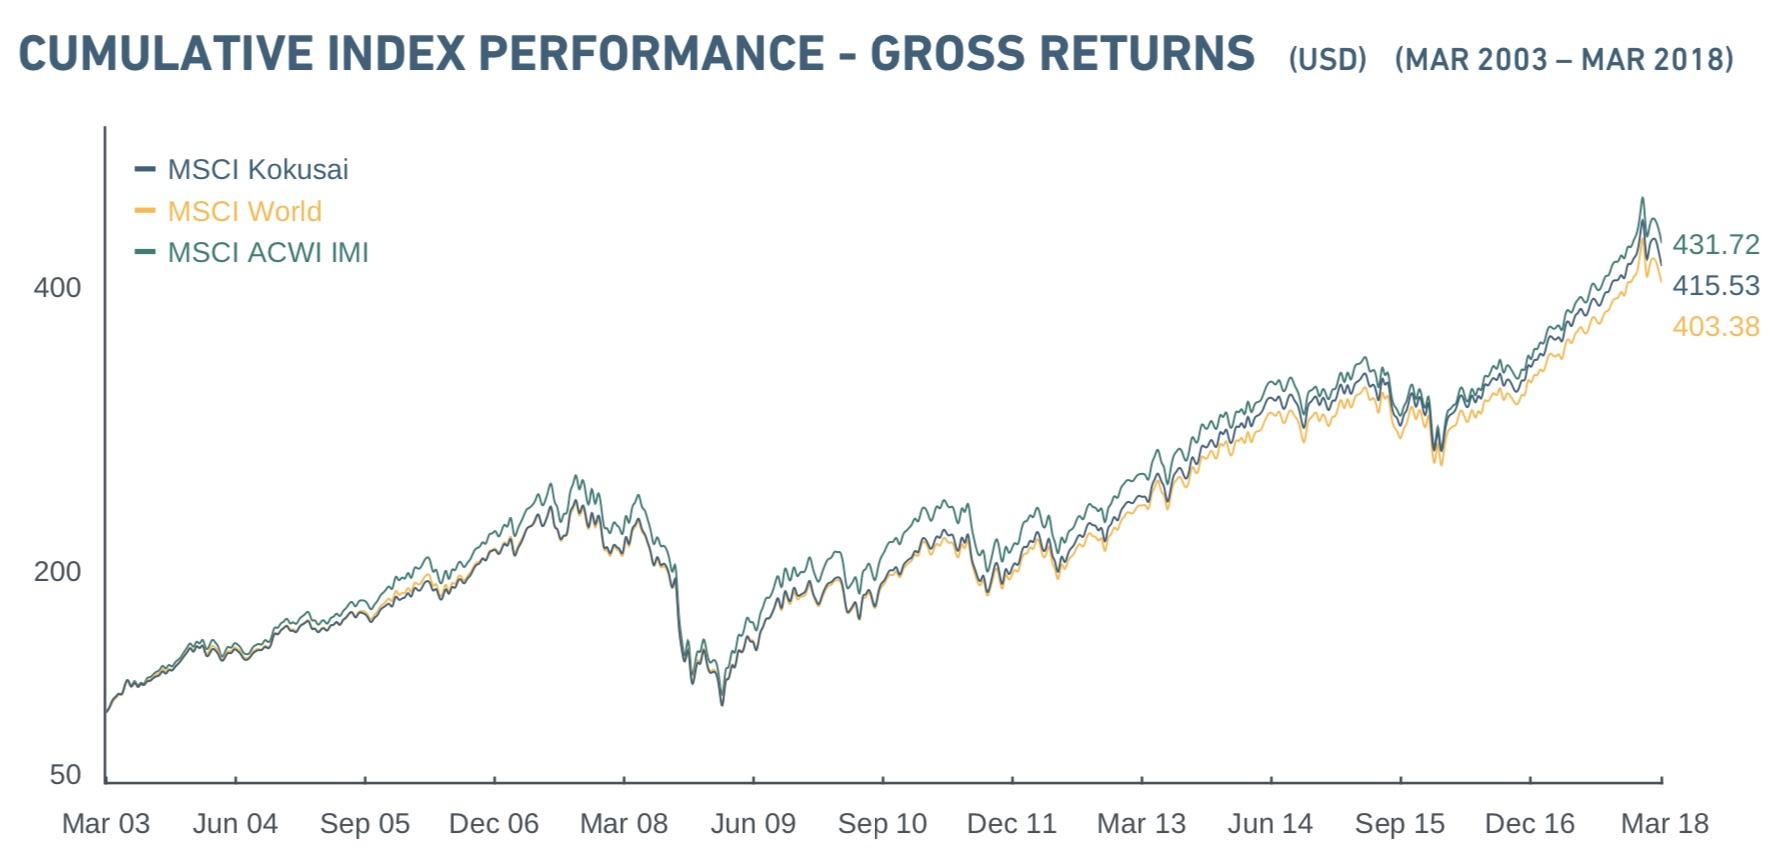 MSCIコクサイのチャートと構成国・組入比率。 | 低コストの投資信託で資産形成 | LoLo Investors